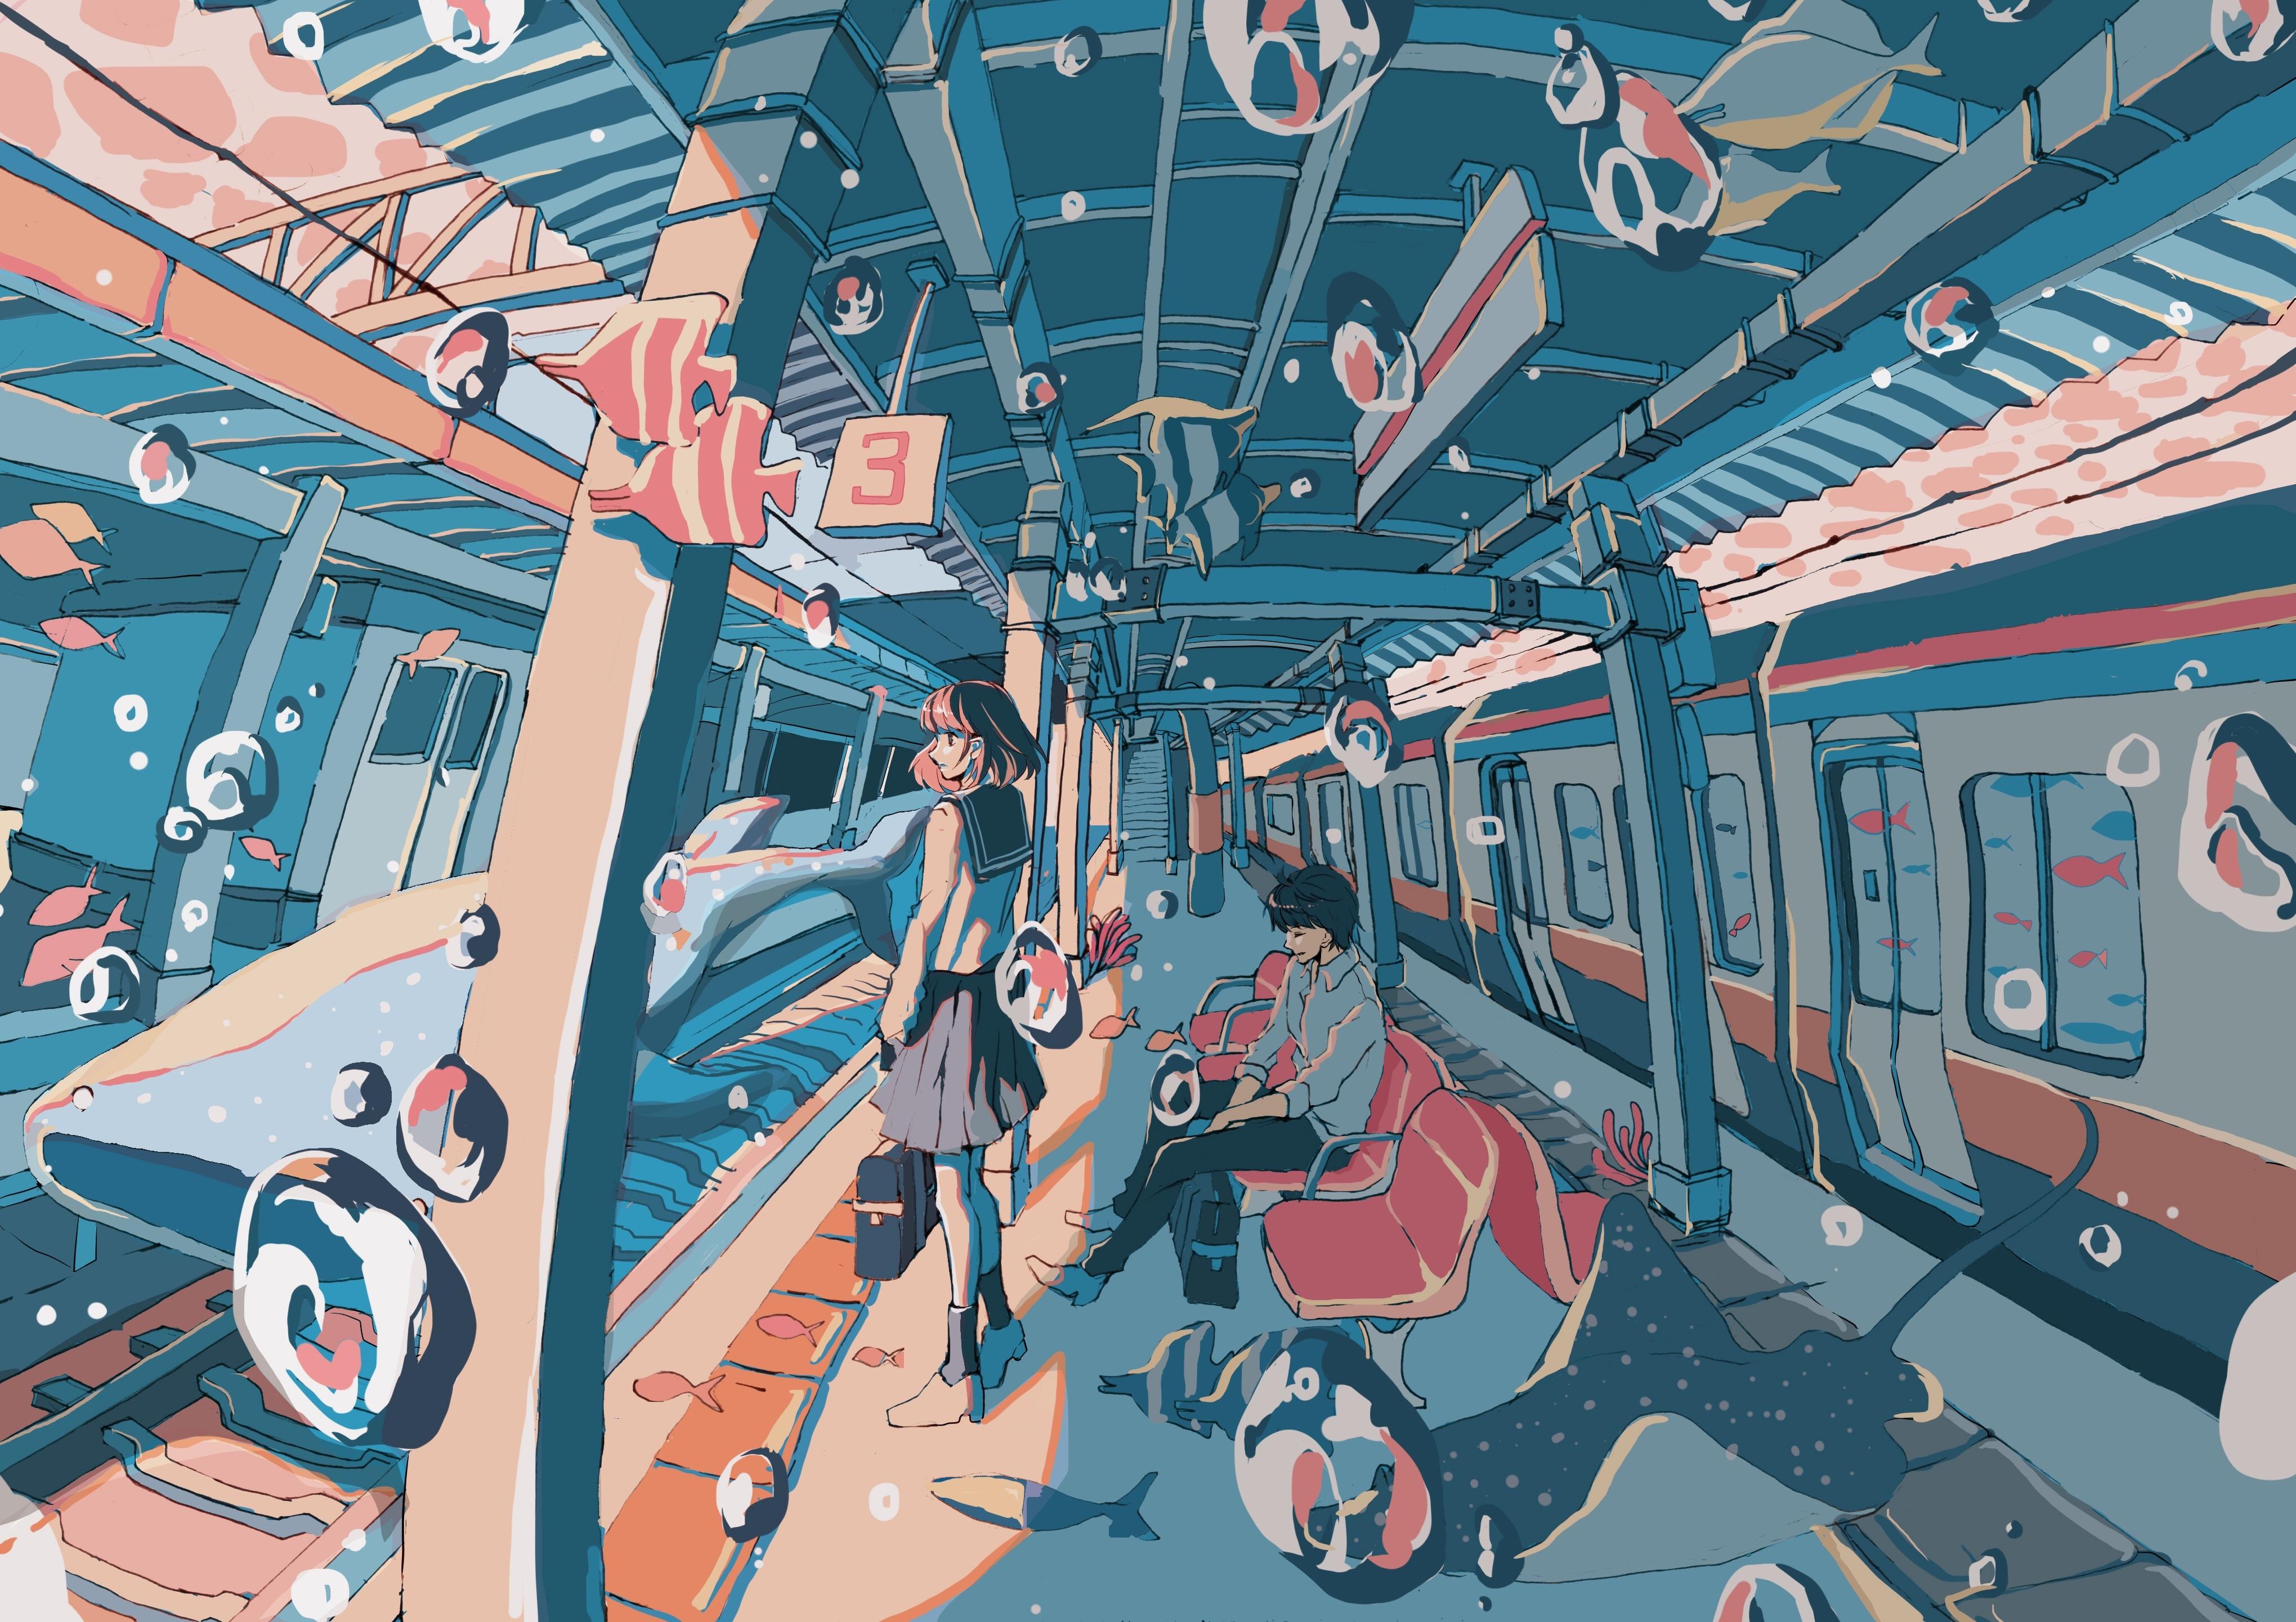 Pixiv日本画师いちご飴插画作品插图29